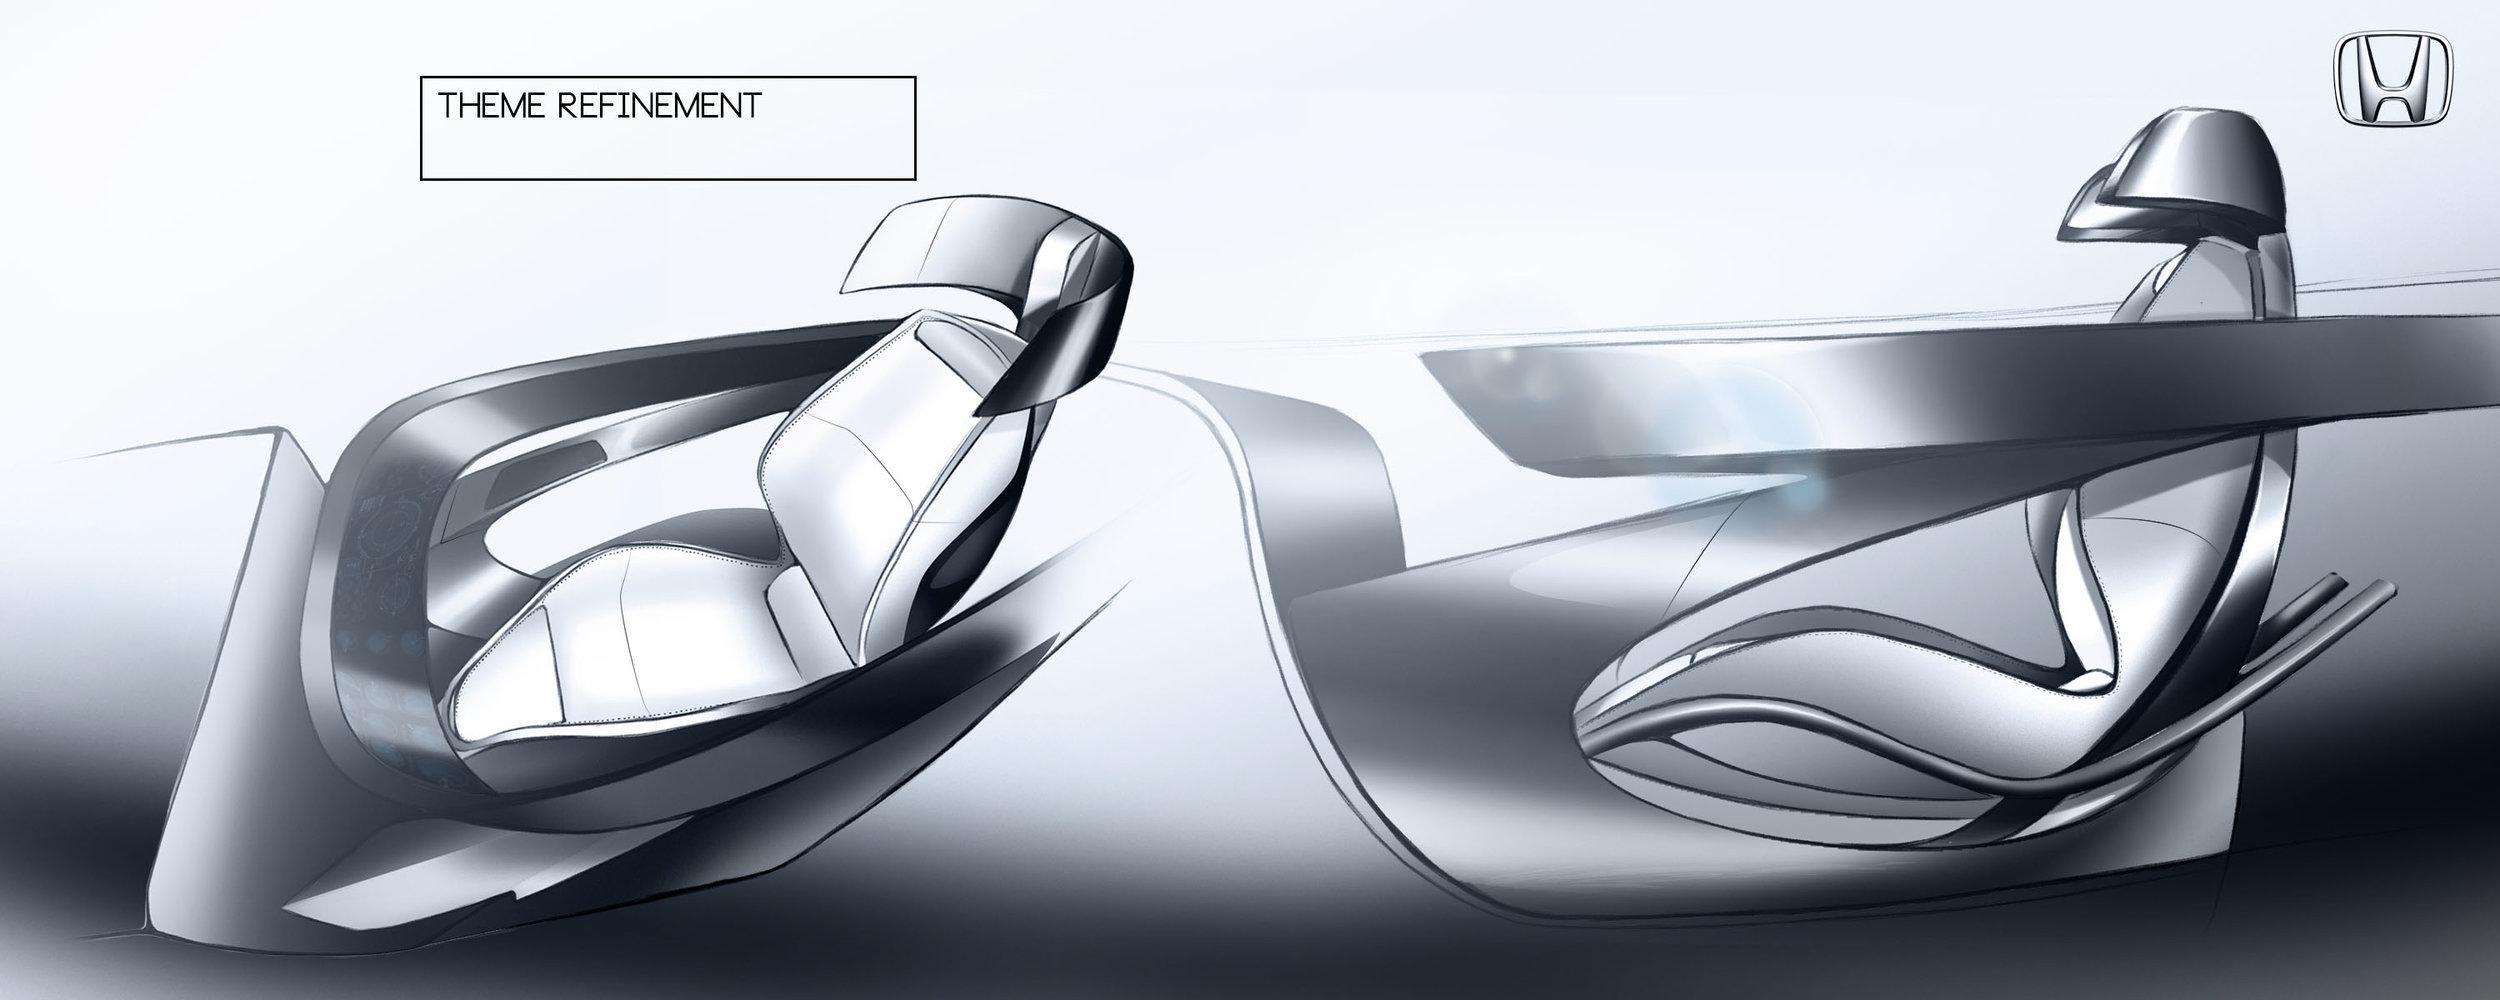 Honda Refinement.jpg